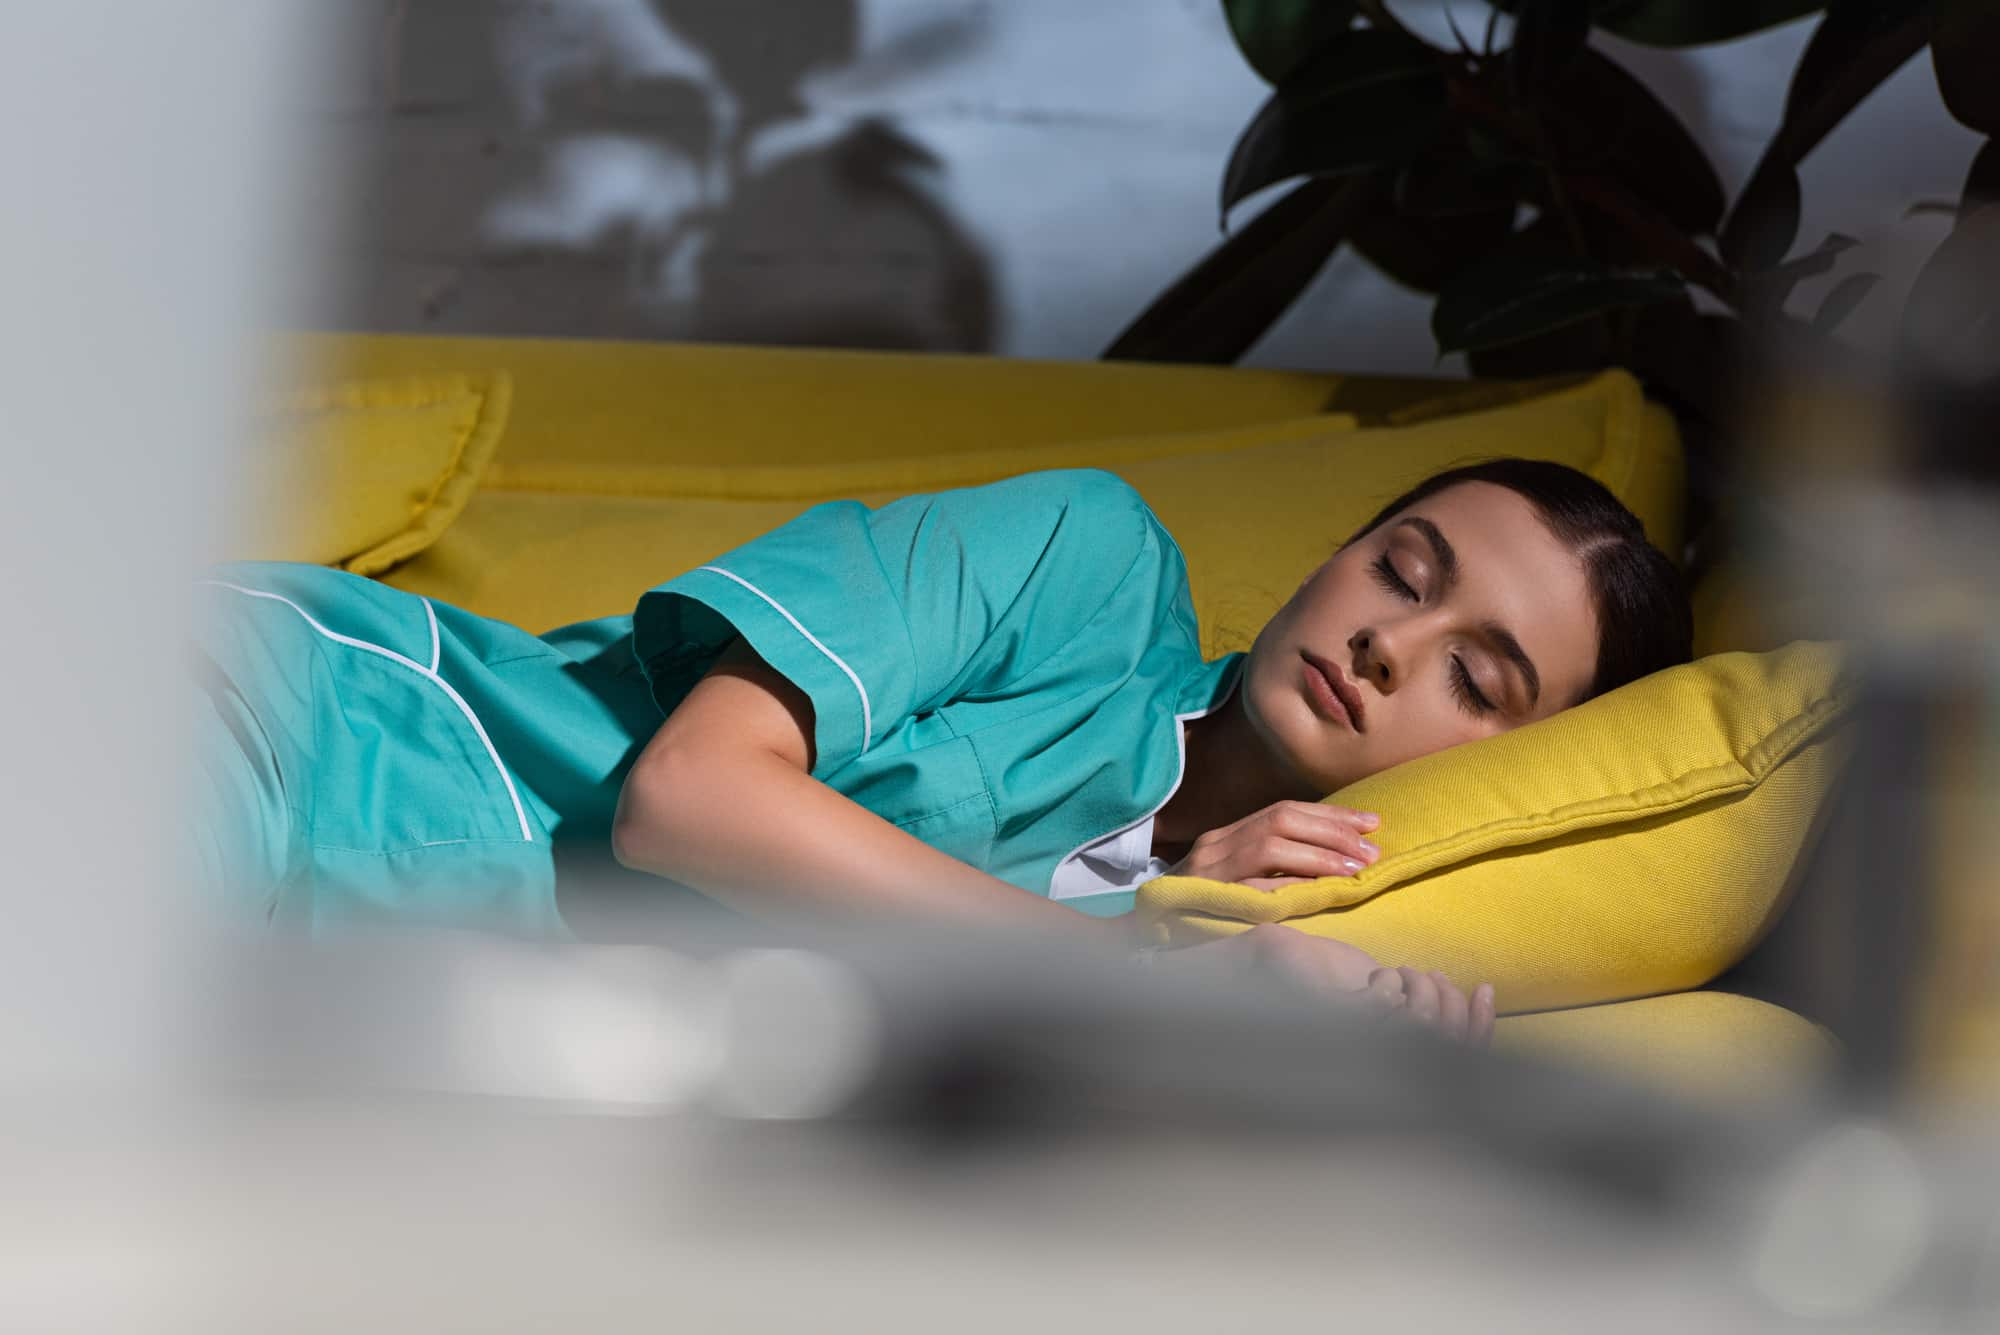 Selective focus of nurse in uniform sleeping on yellow sofa during night shift